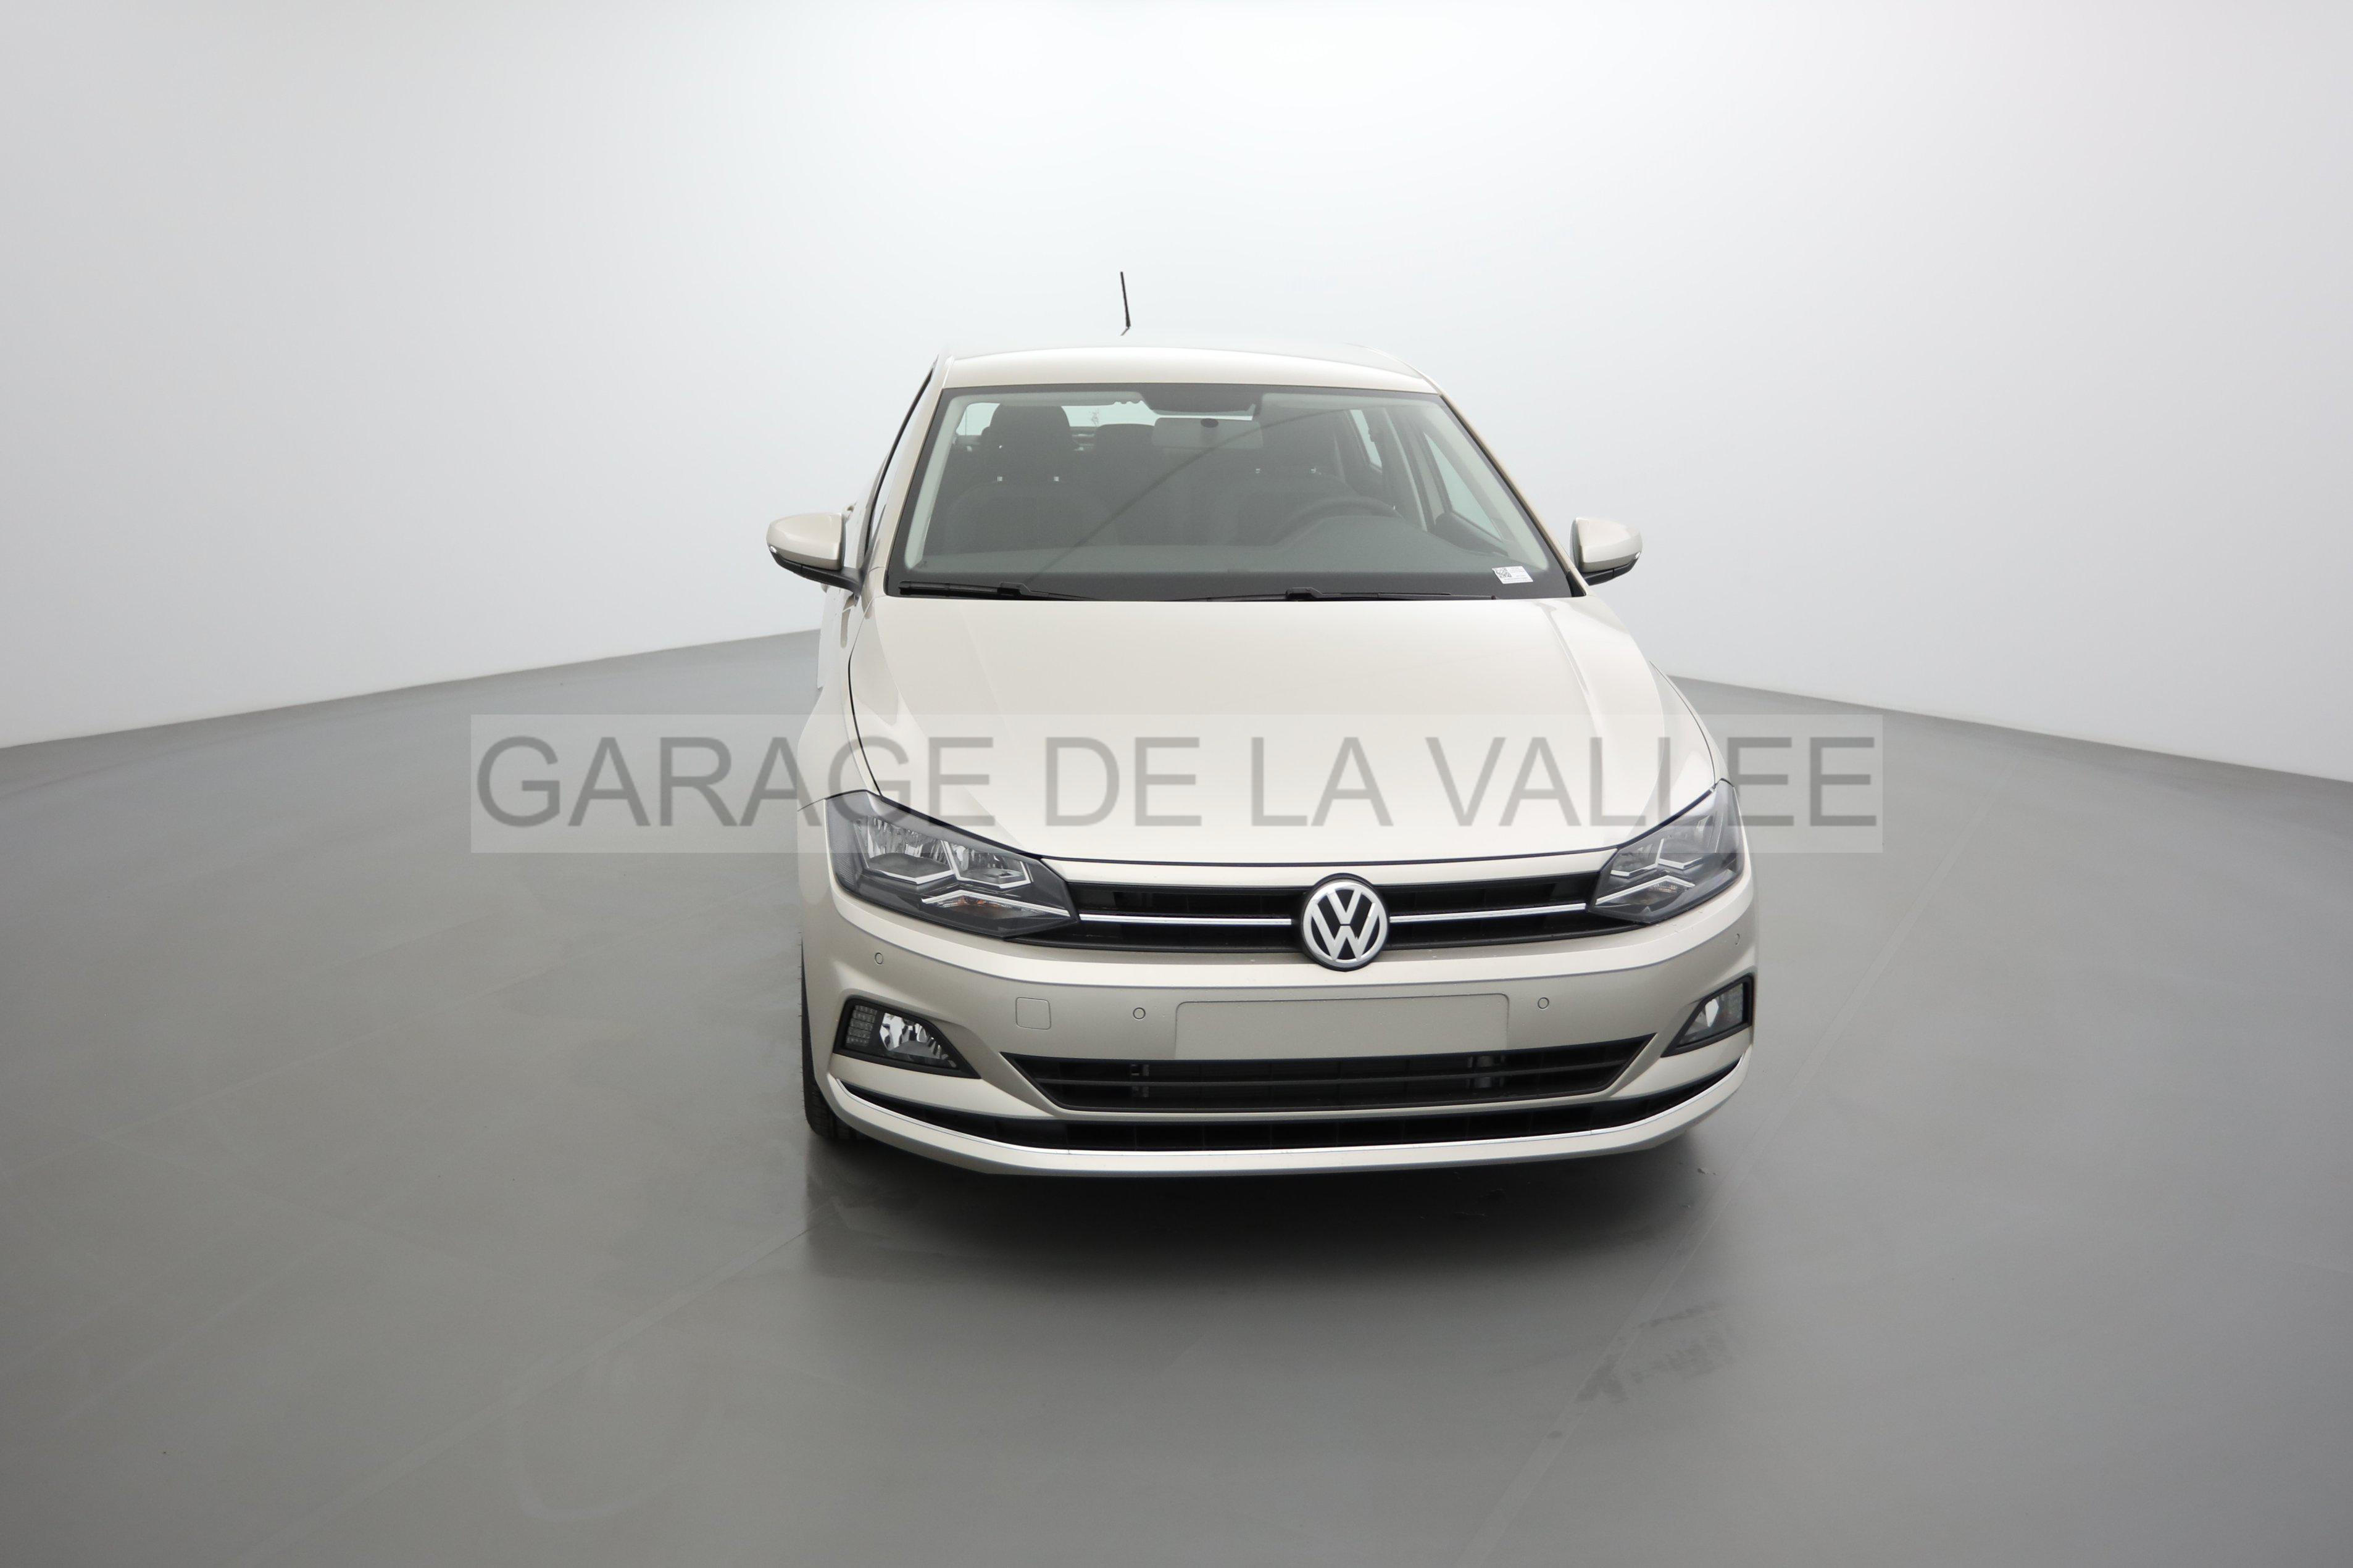 Garage Volkswagen Pouzauges